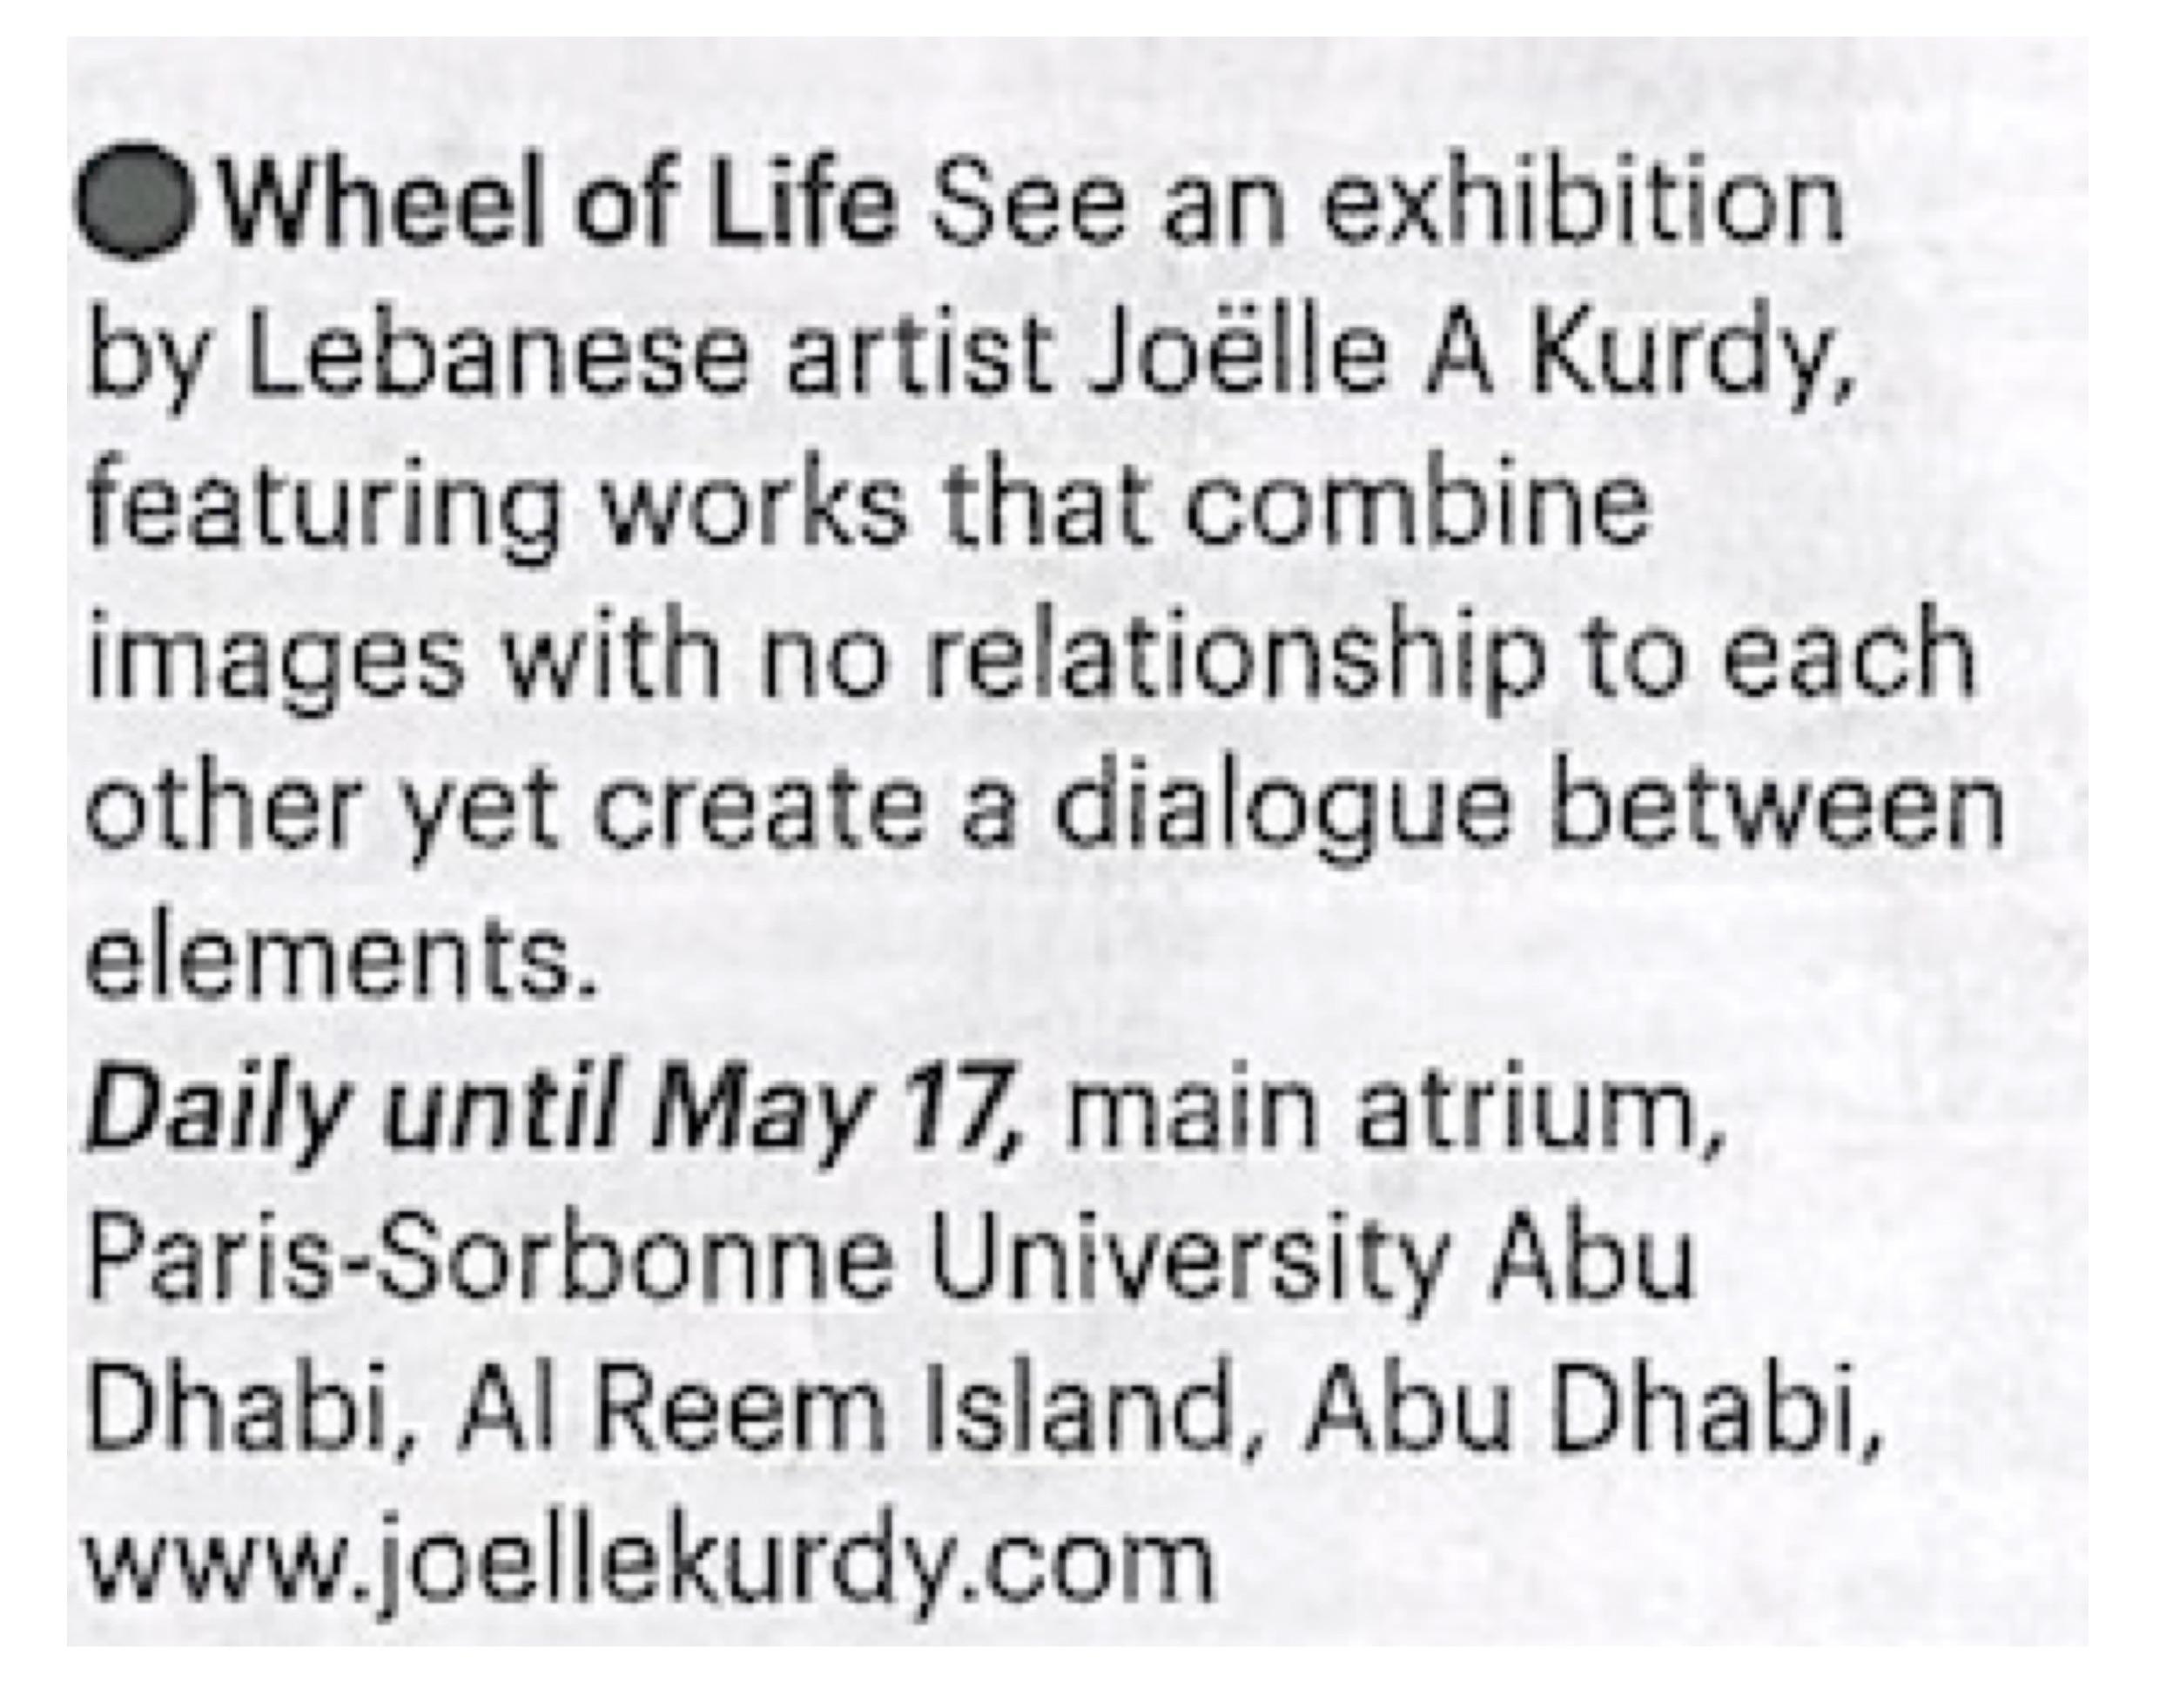 Joelle A Kurdy  - May 12th 2016 - The National copy3.jpg